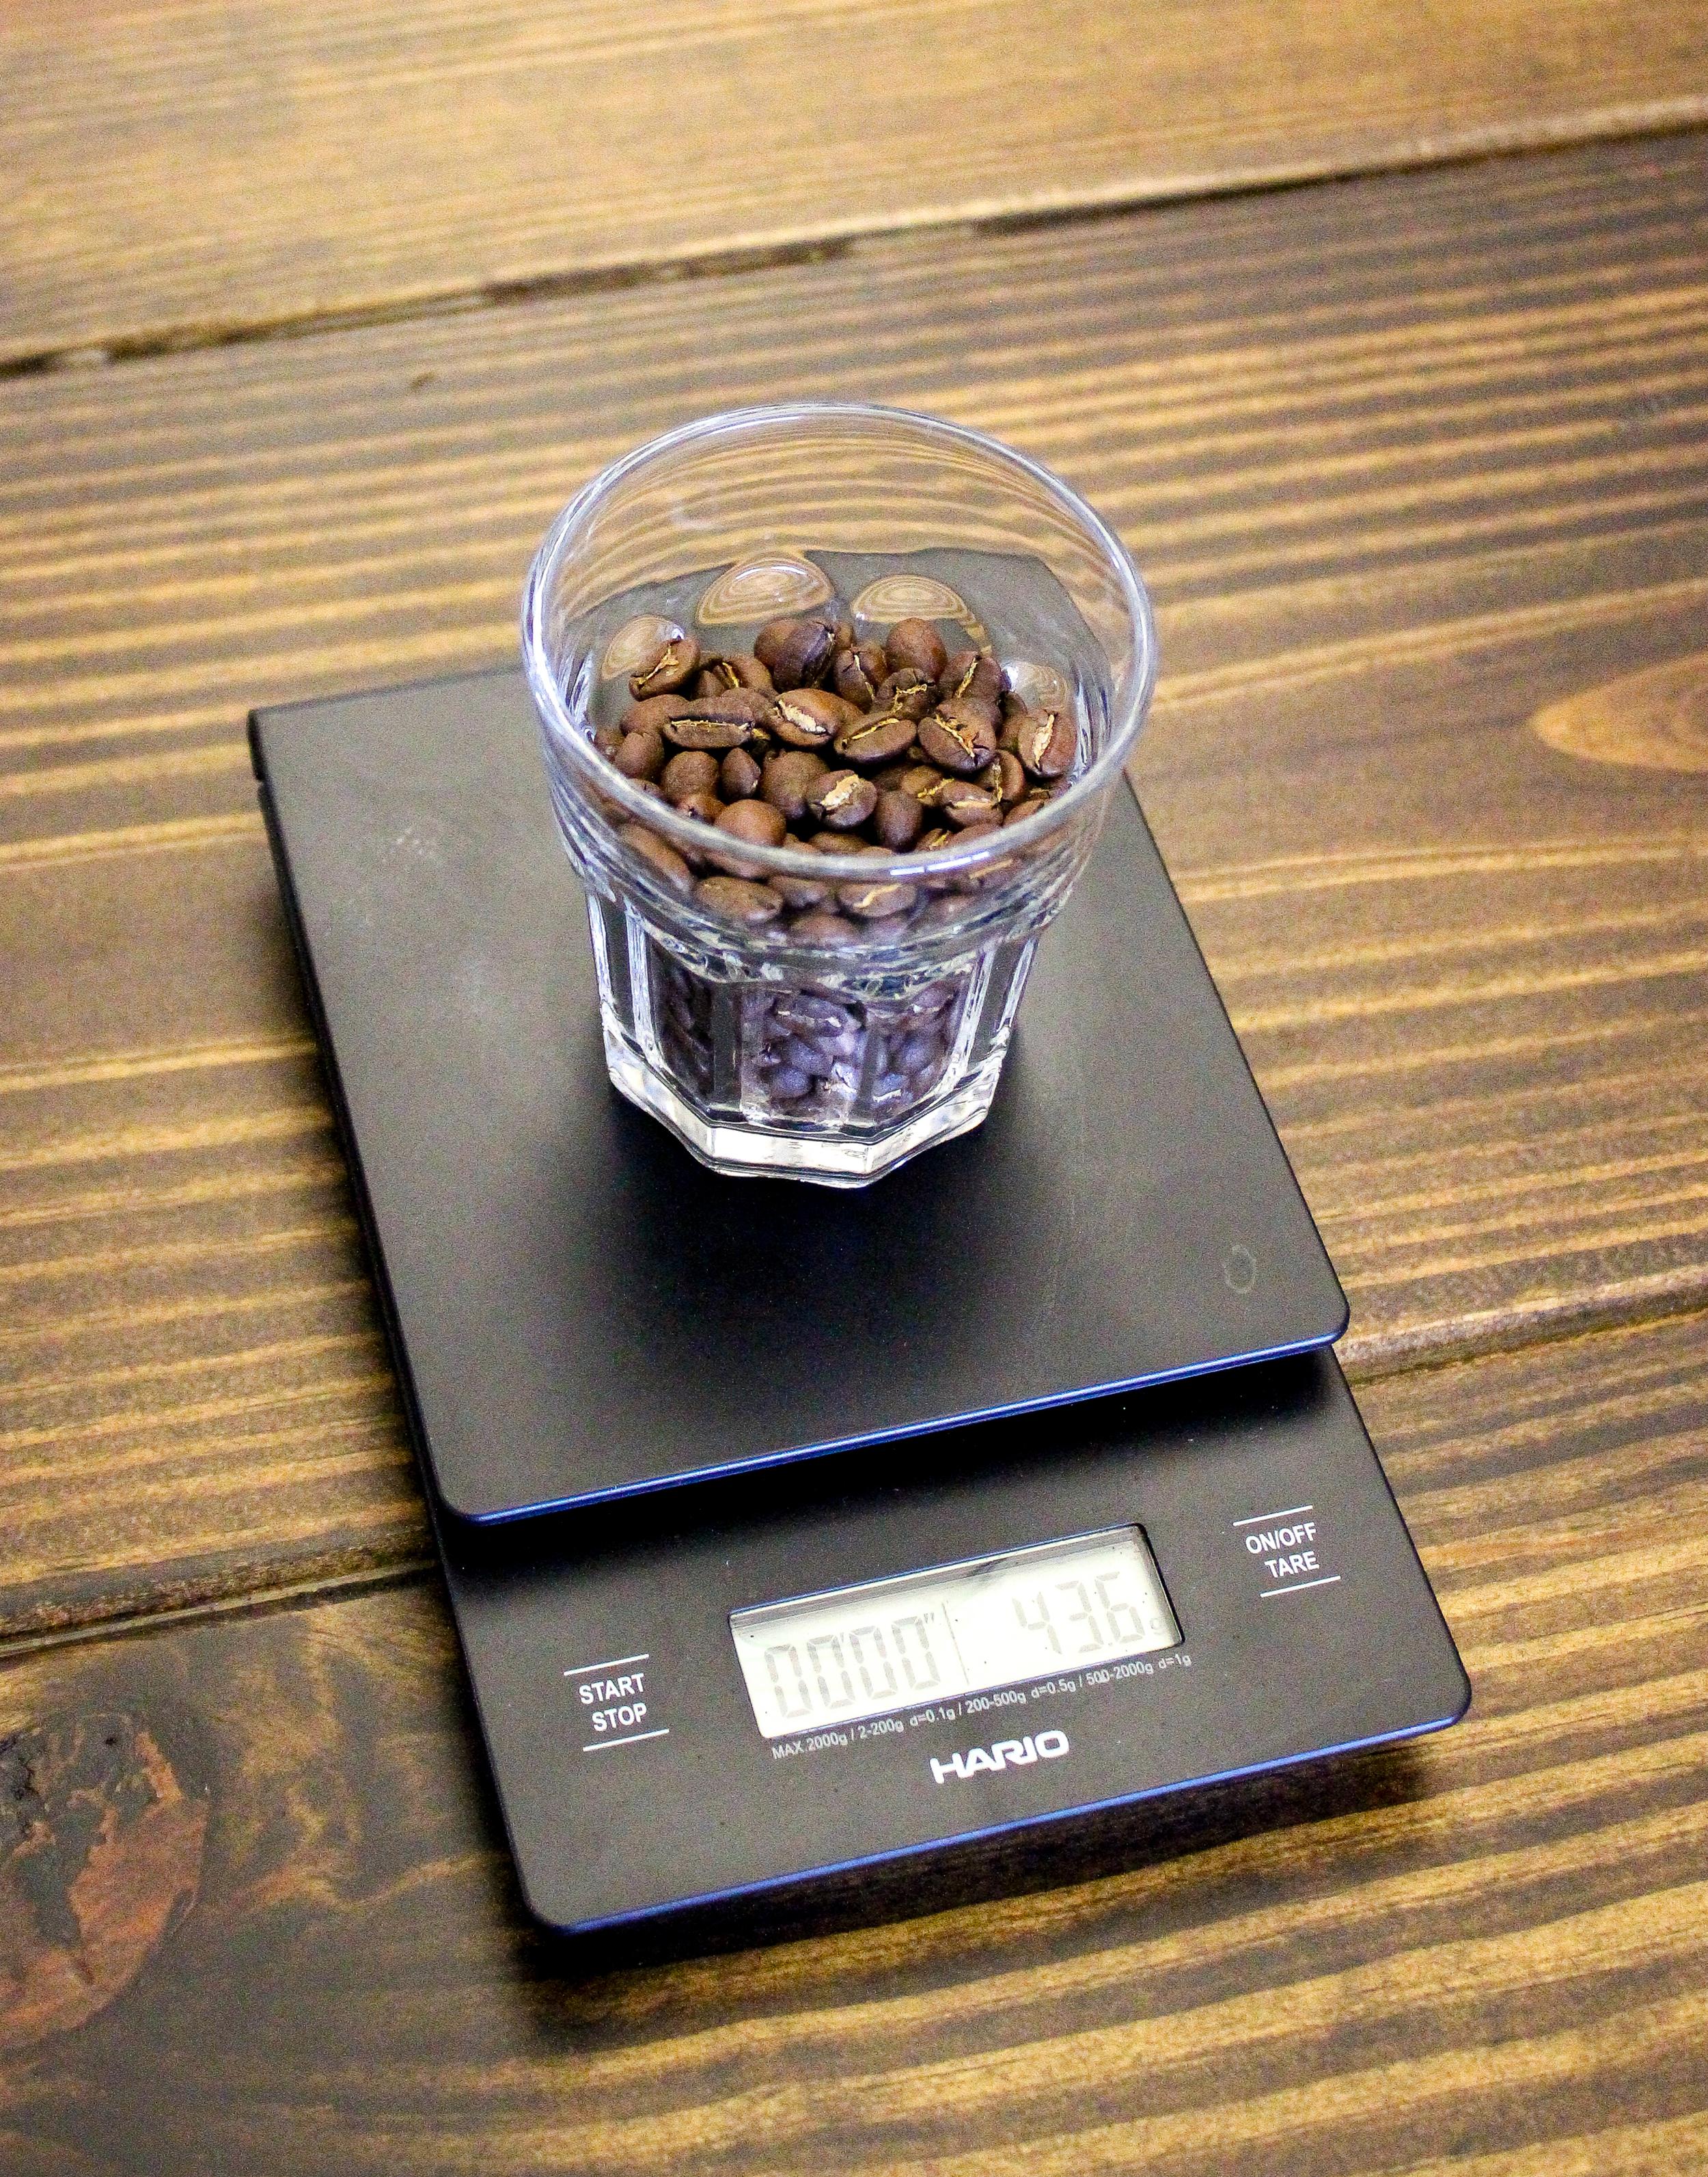 2. Weigh out 44 grams of coffee. Grind to medium-coarse consistancy (like turbinado sugar).